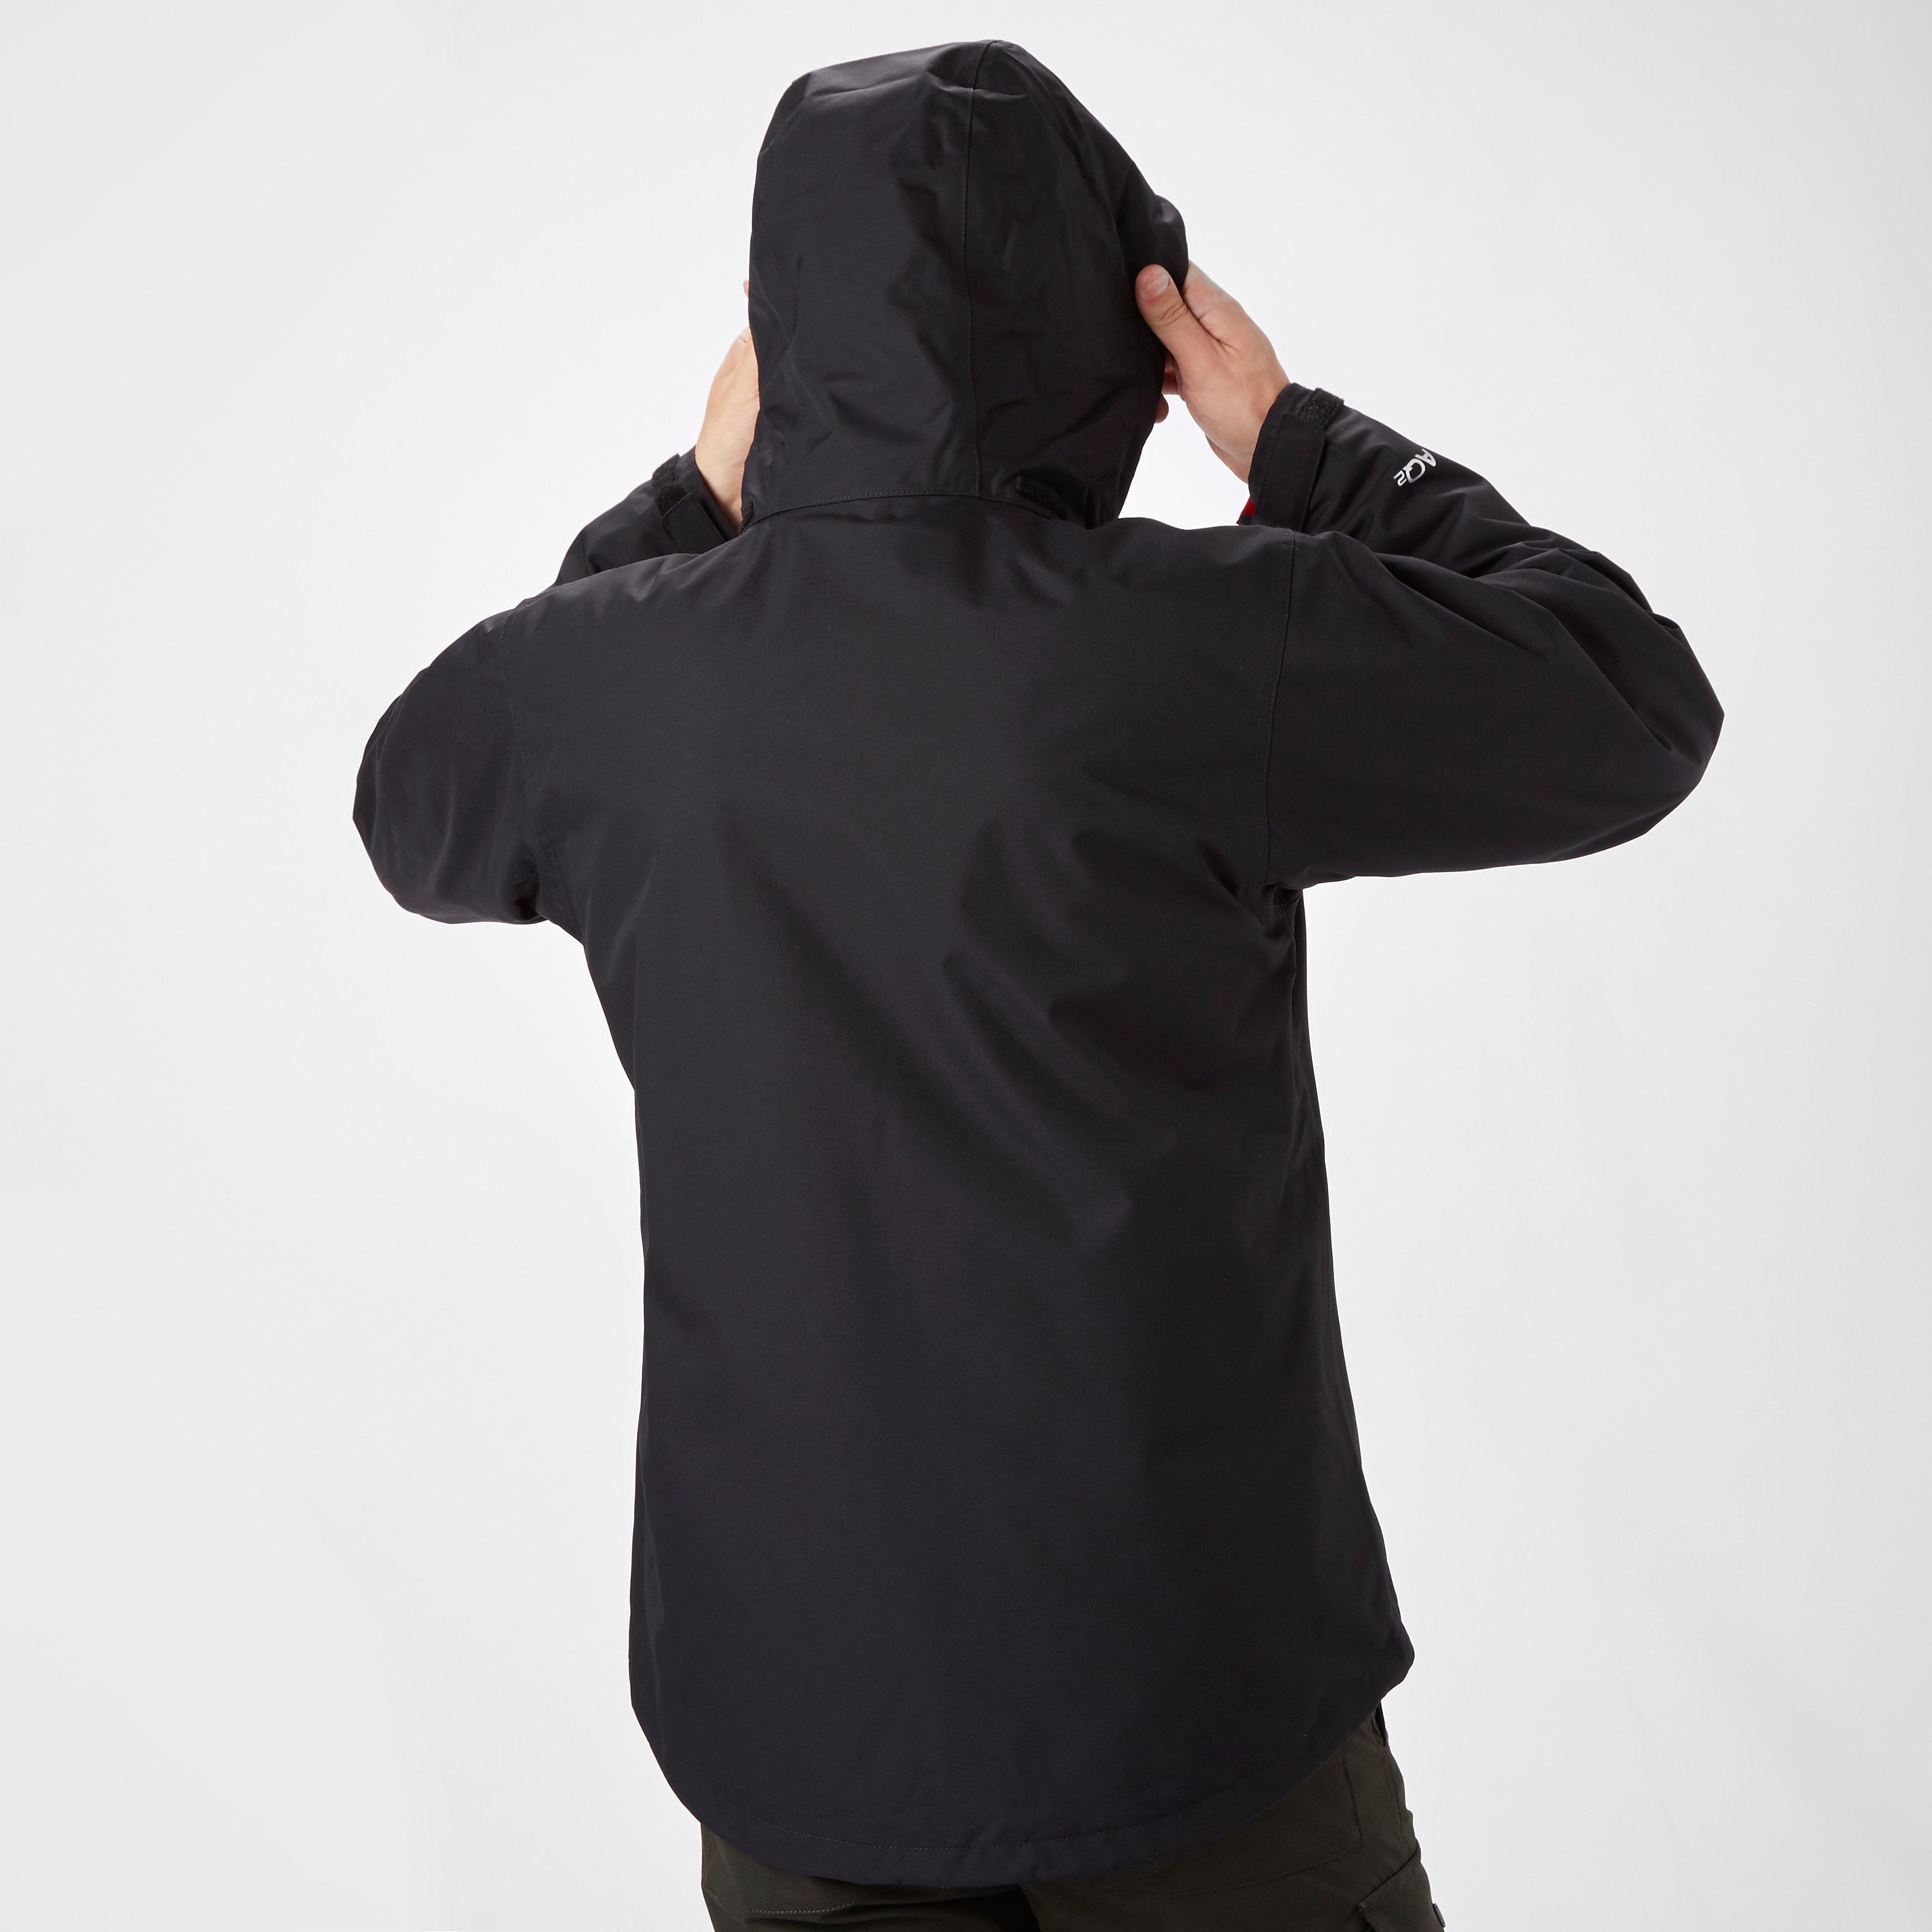 Berghaus RG Delta 3-in-1 AQ2 Men's Jacket